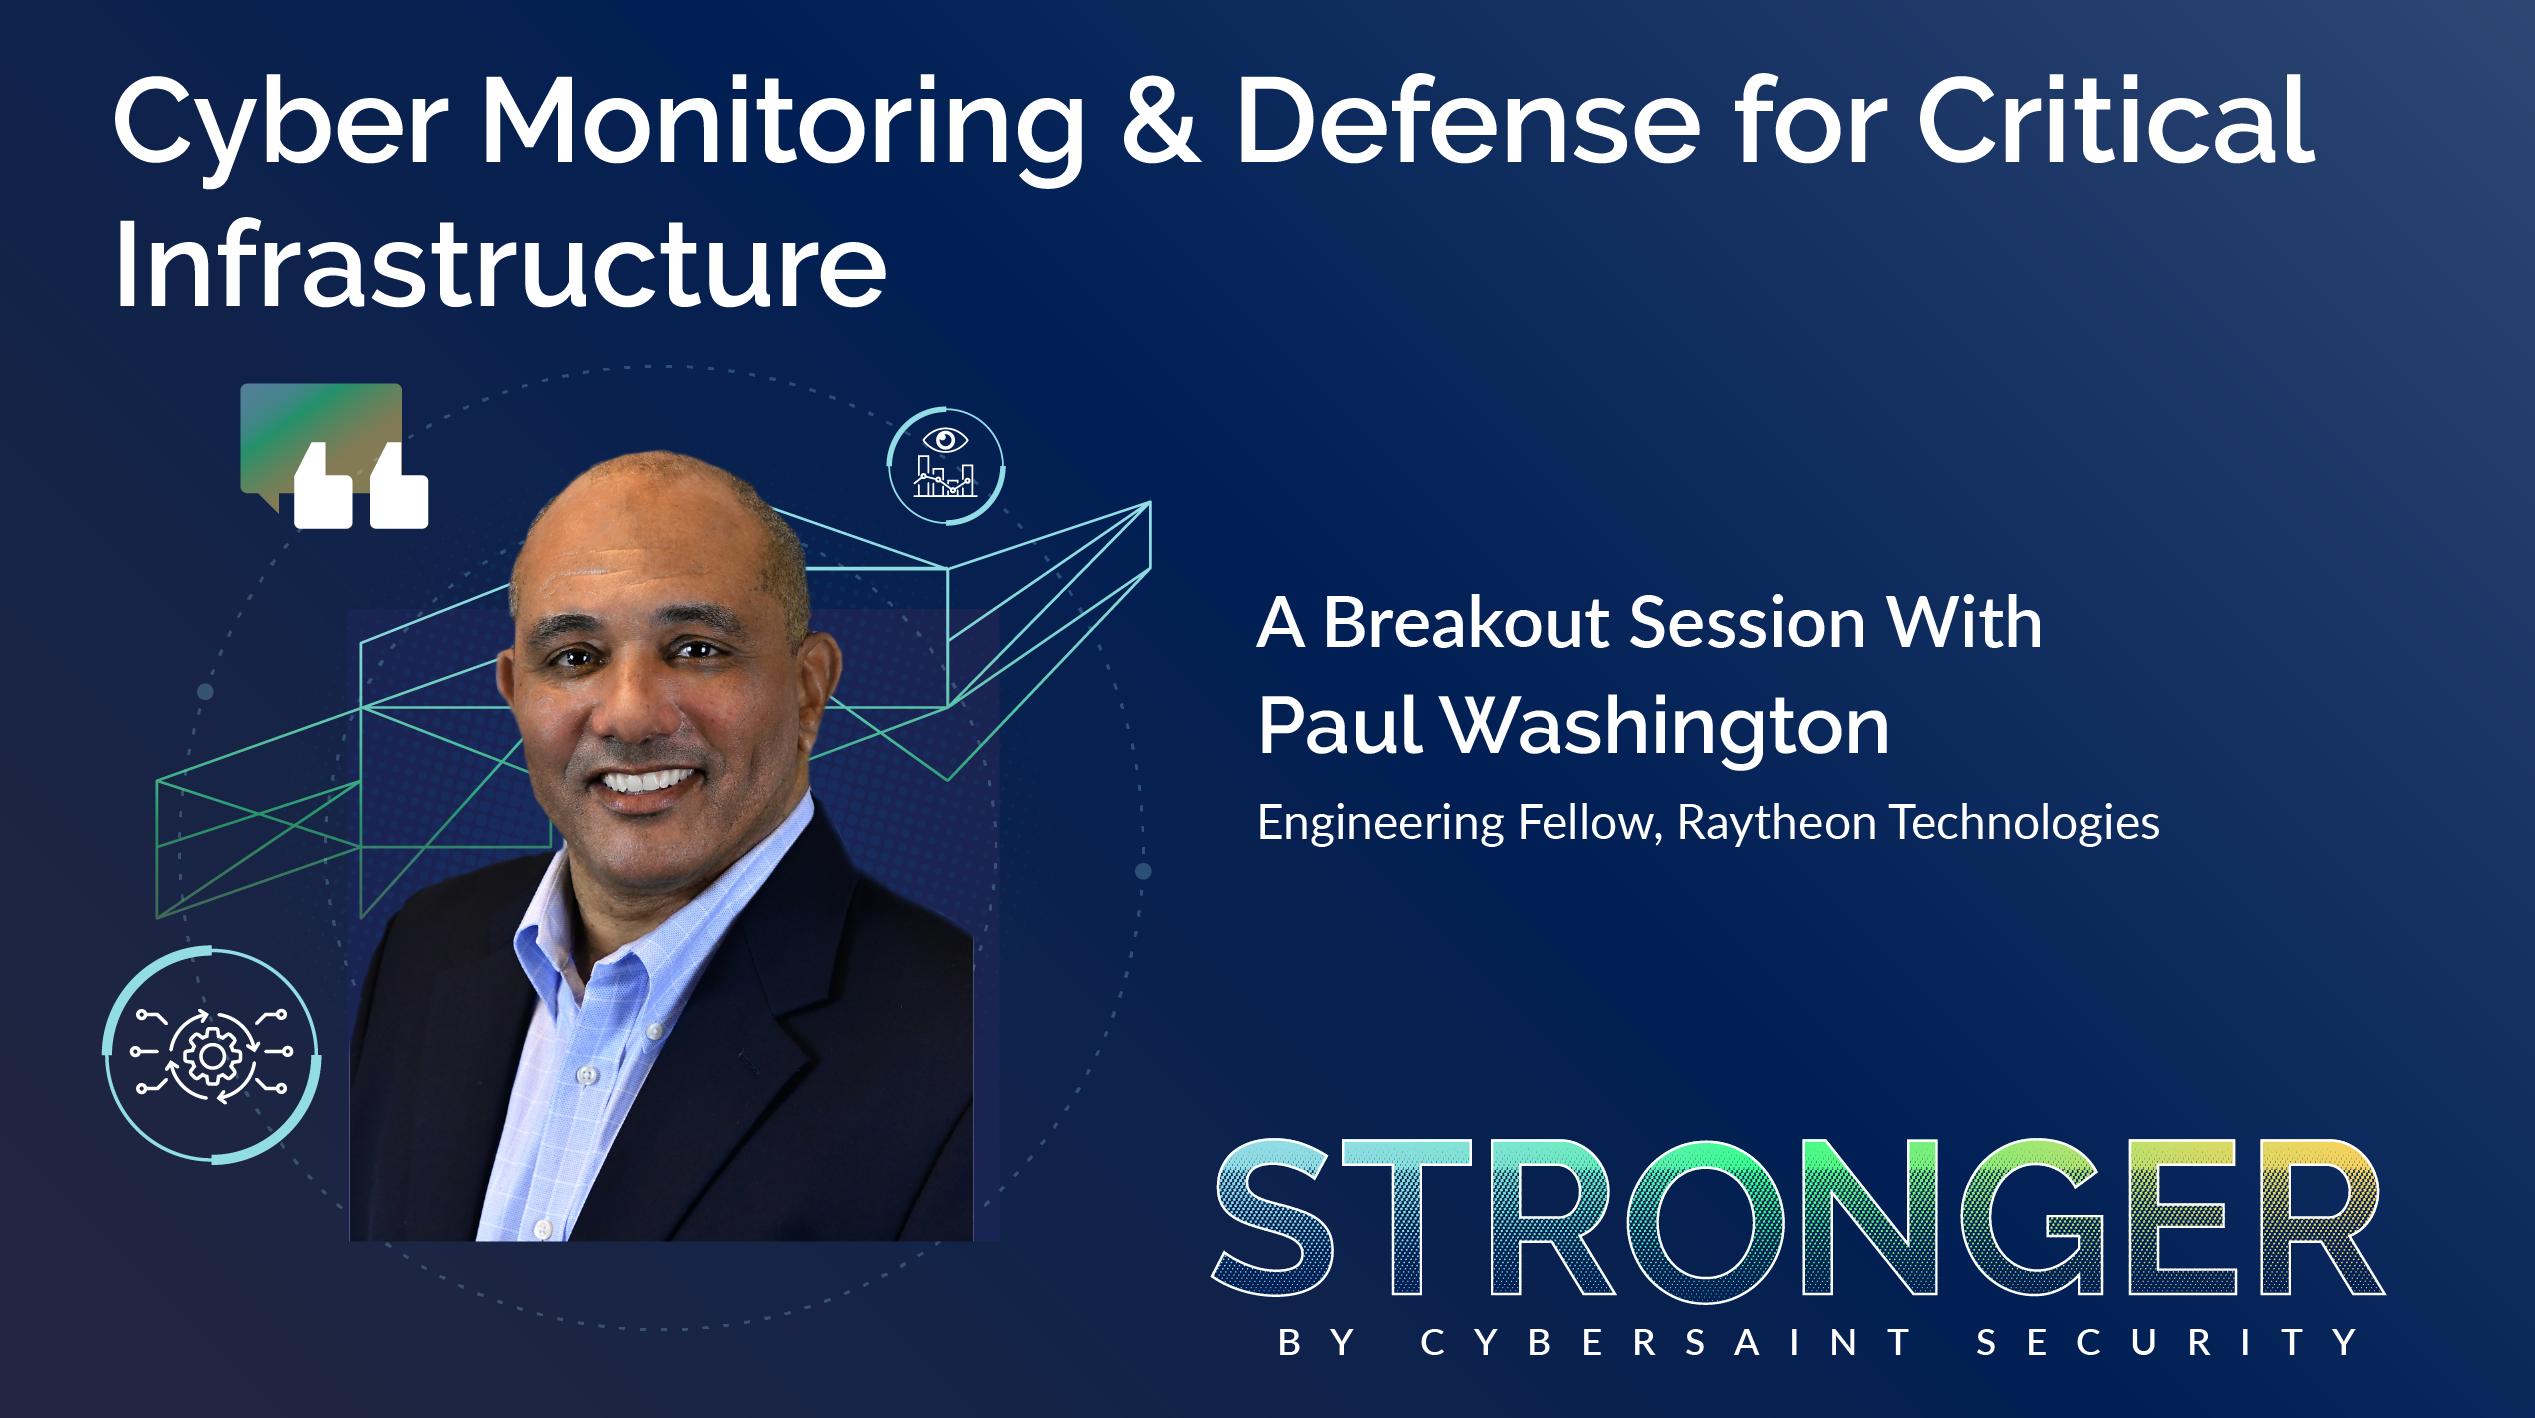 CyberSaint Raytheon Technologies